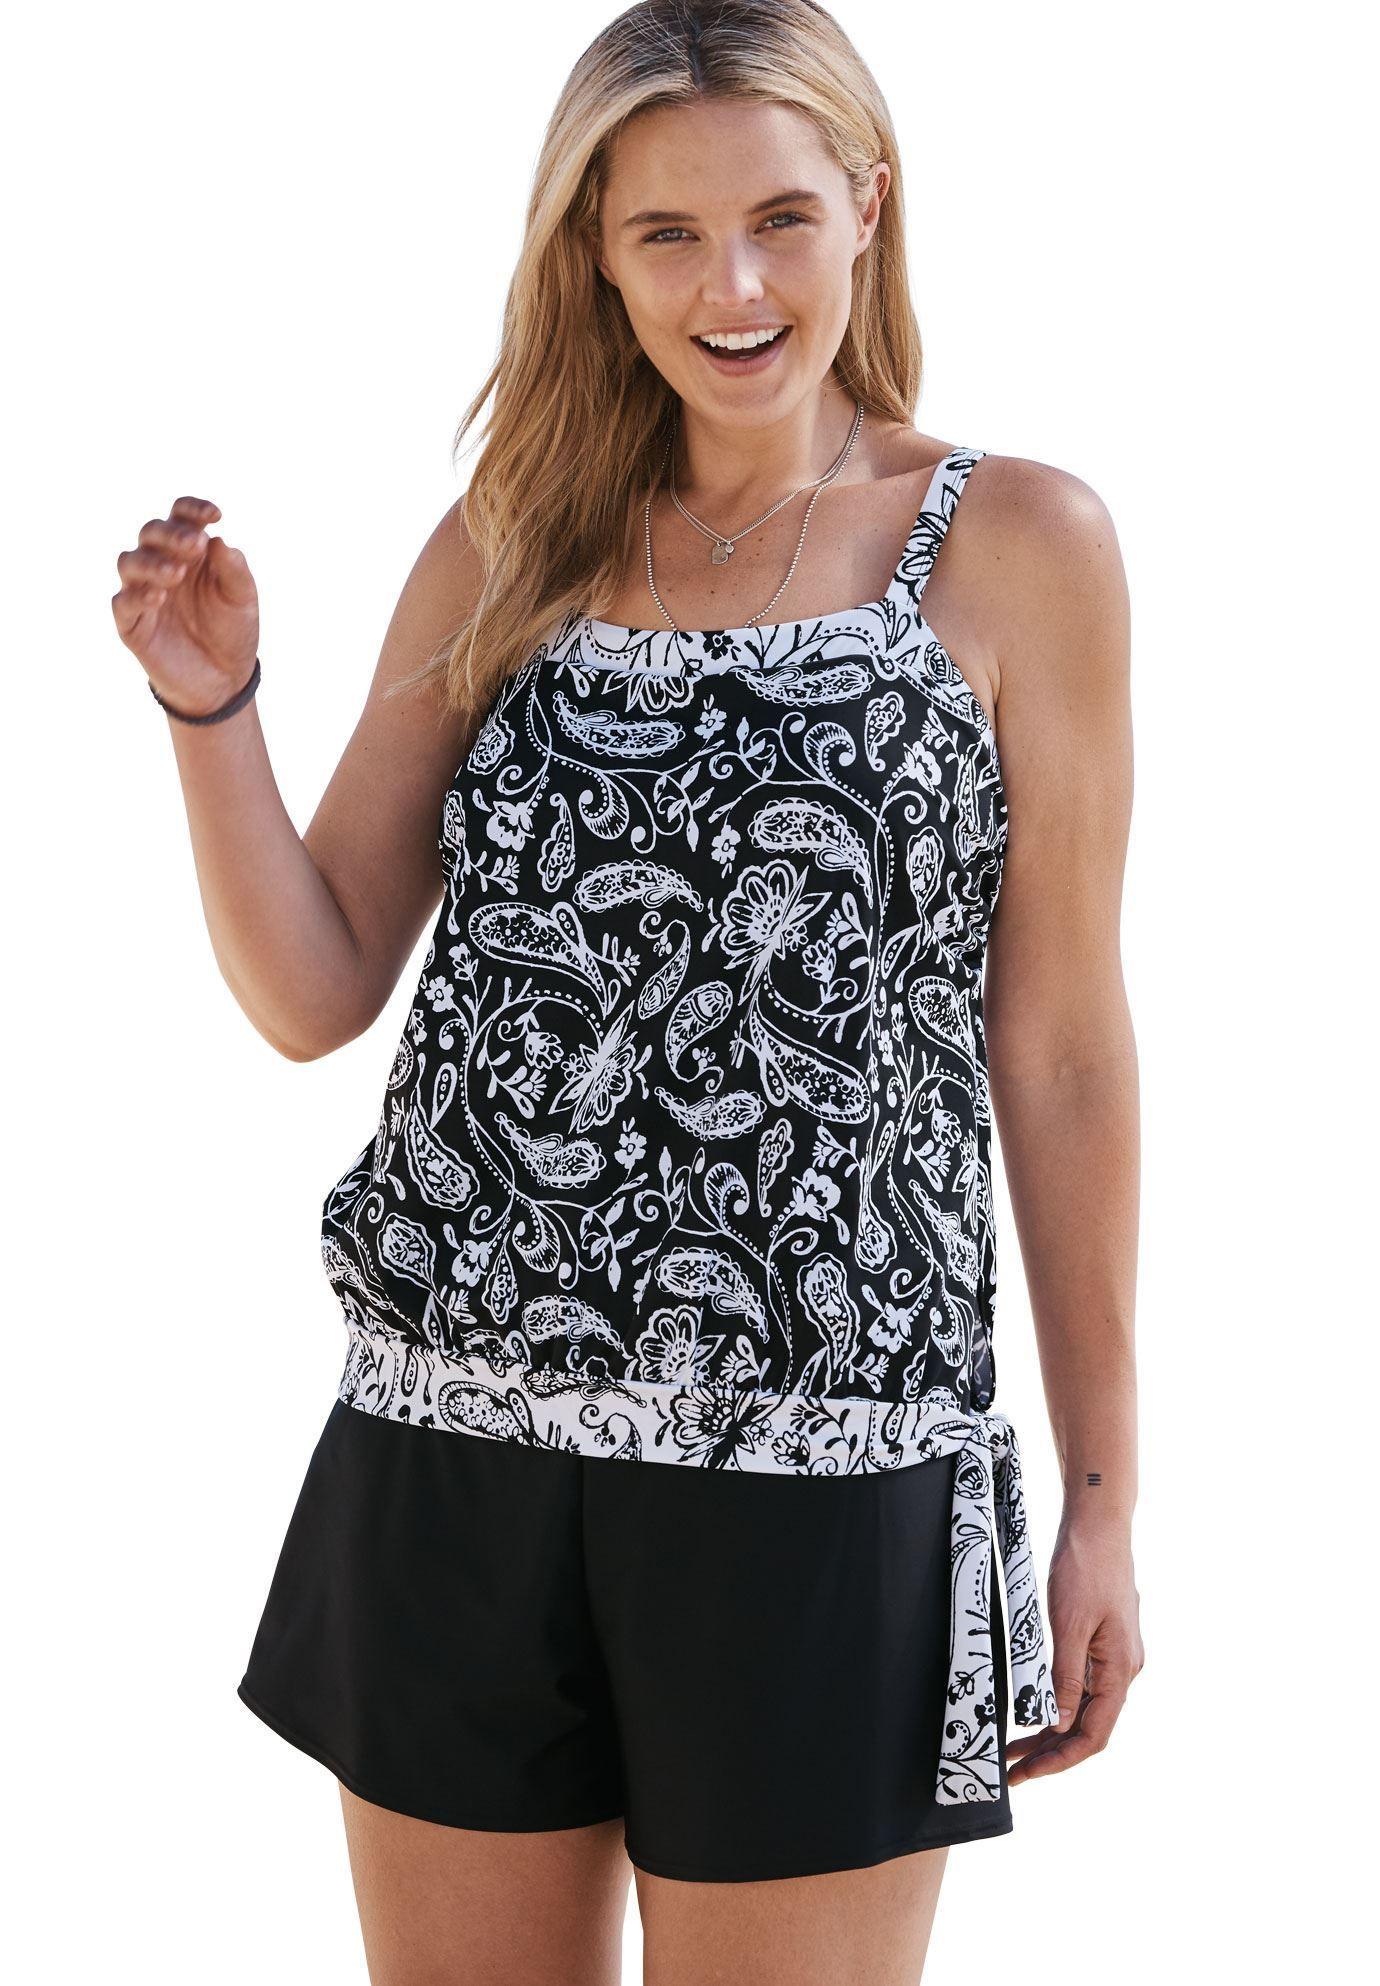 e01ffa1b8bc Side-tie  tankini top with blouson by Swim 365 - Women s Plus Size Clothing